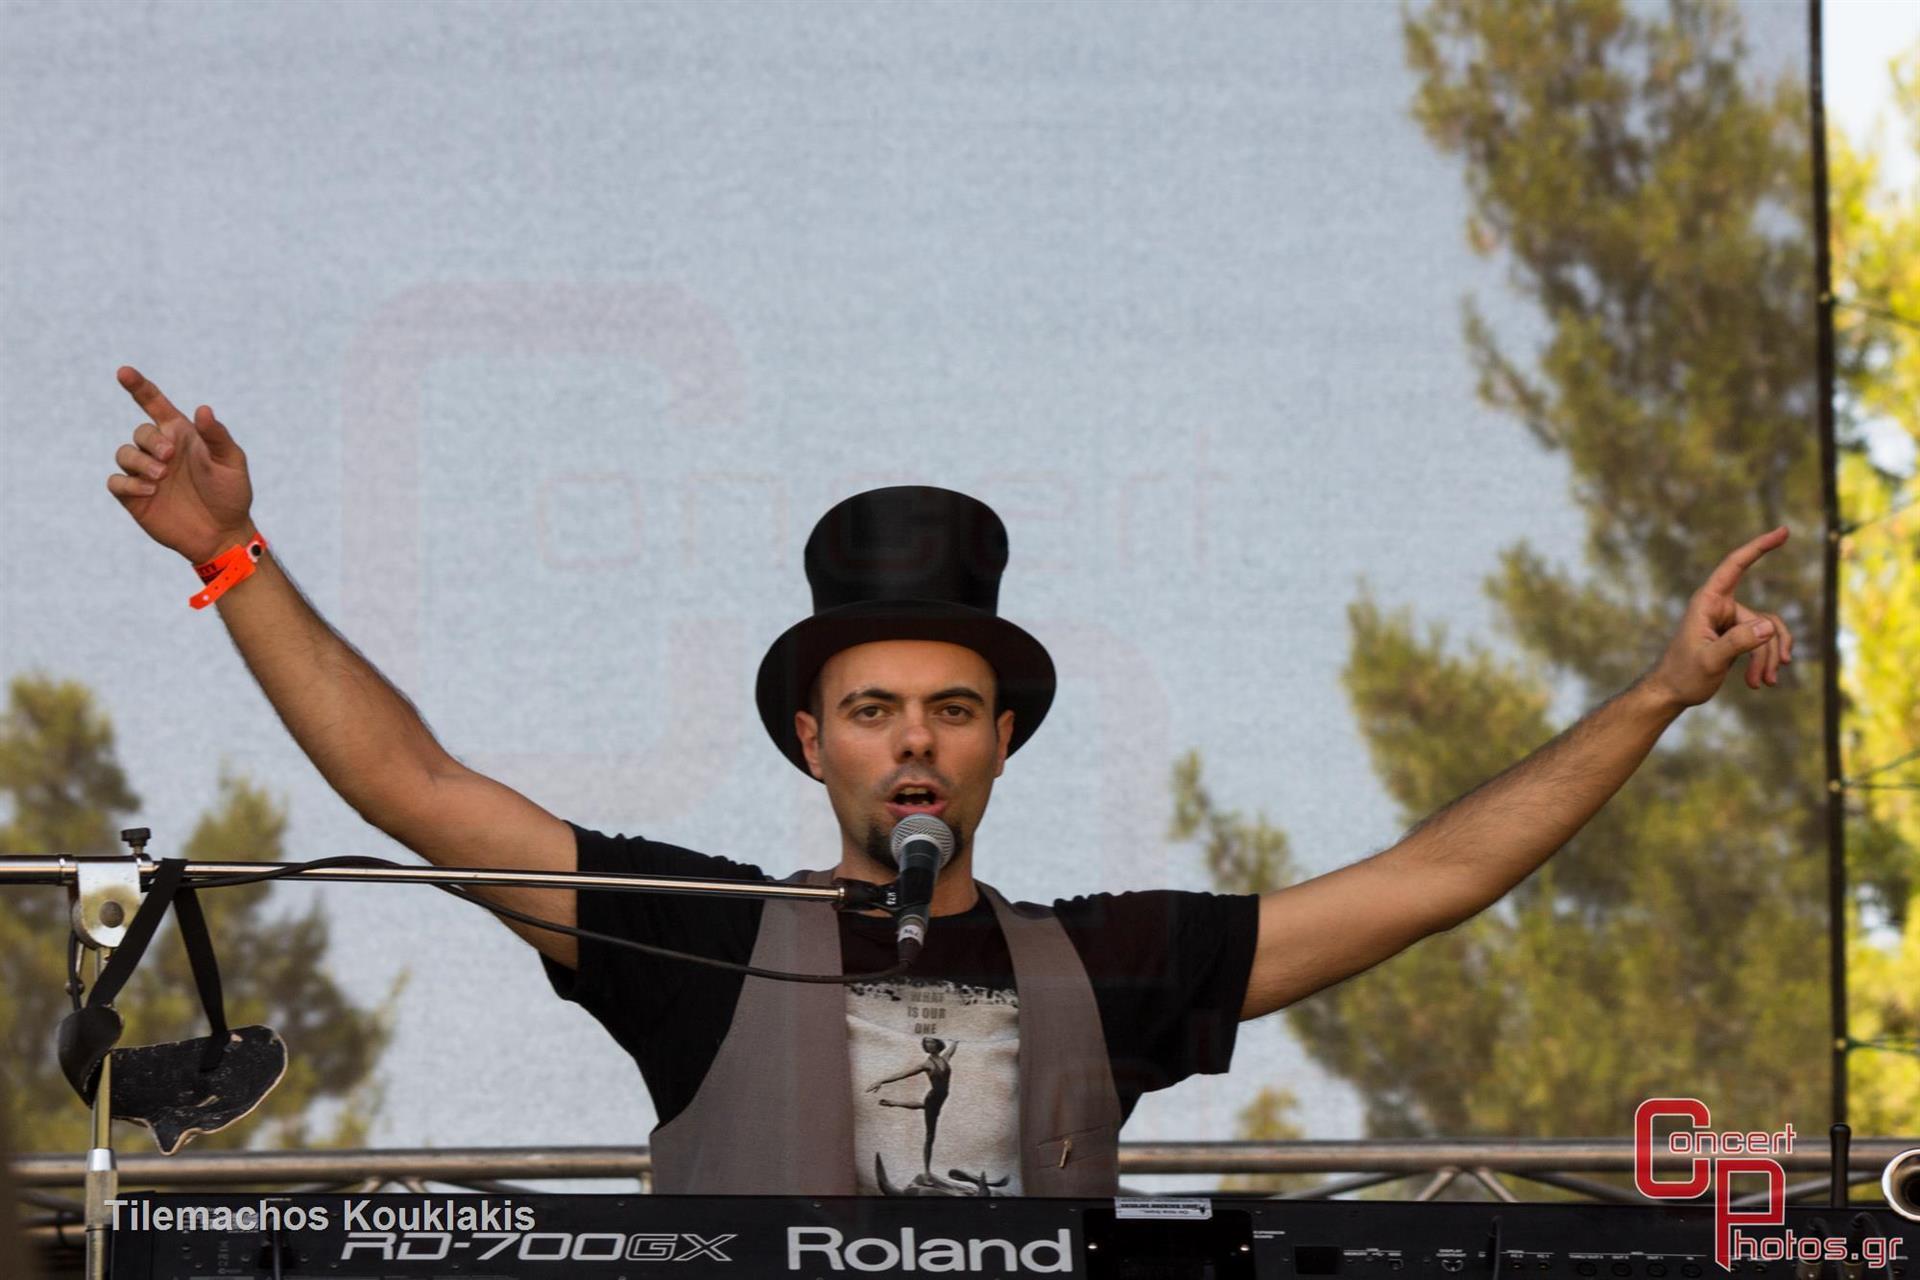 Opera Chaotique-Opera Chaotique photographer: Tilemachos Kouklakis - concertphotos_-0066